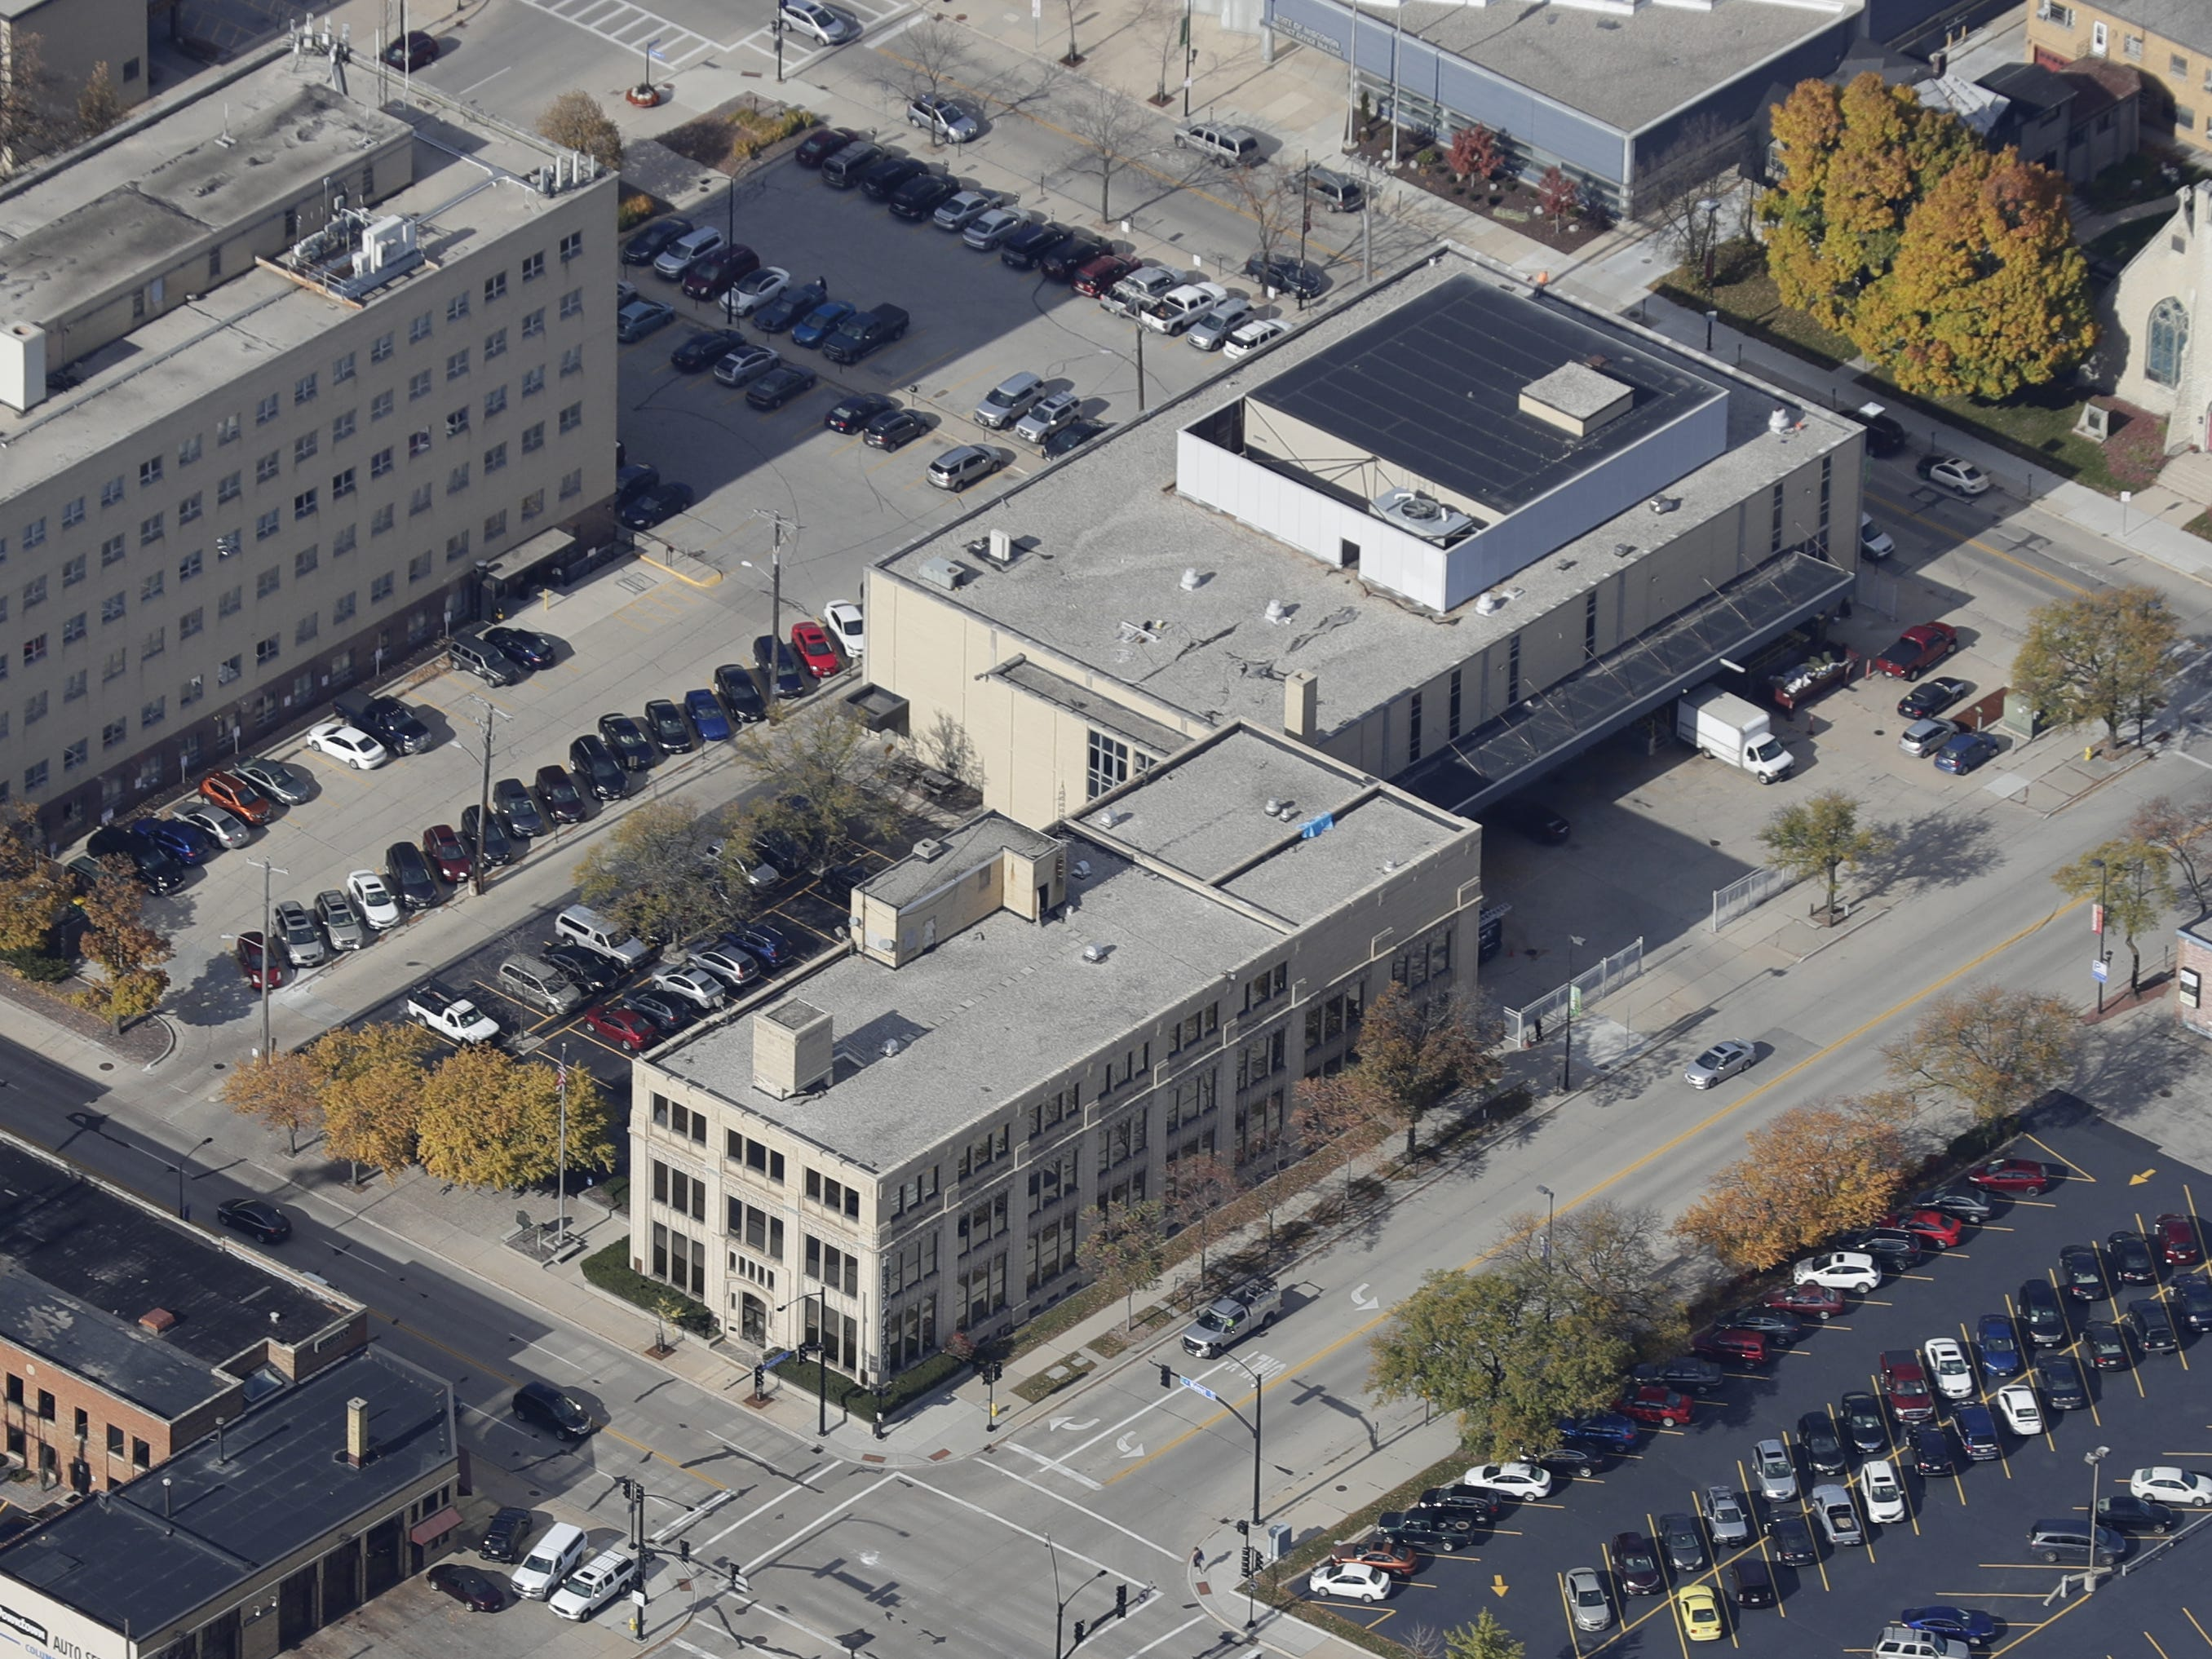 Green Bay Press-Gazette building and City Hall.